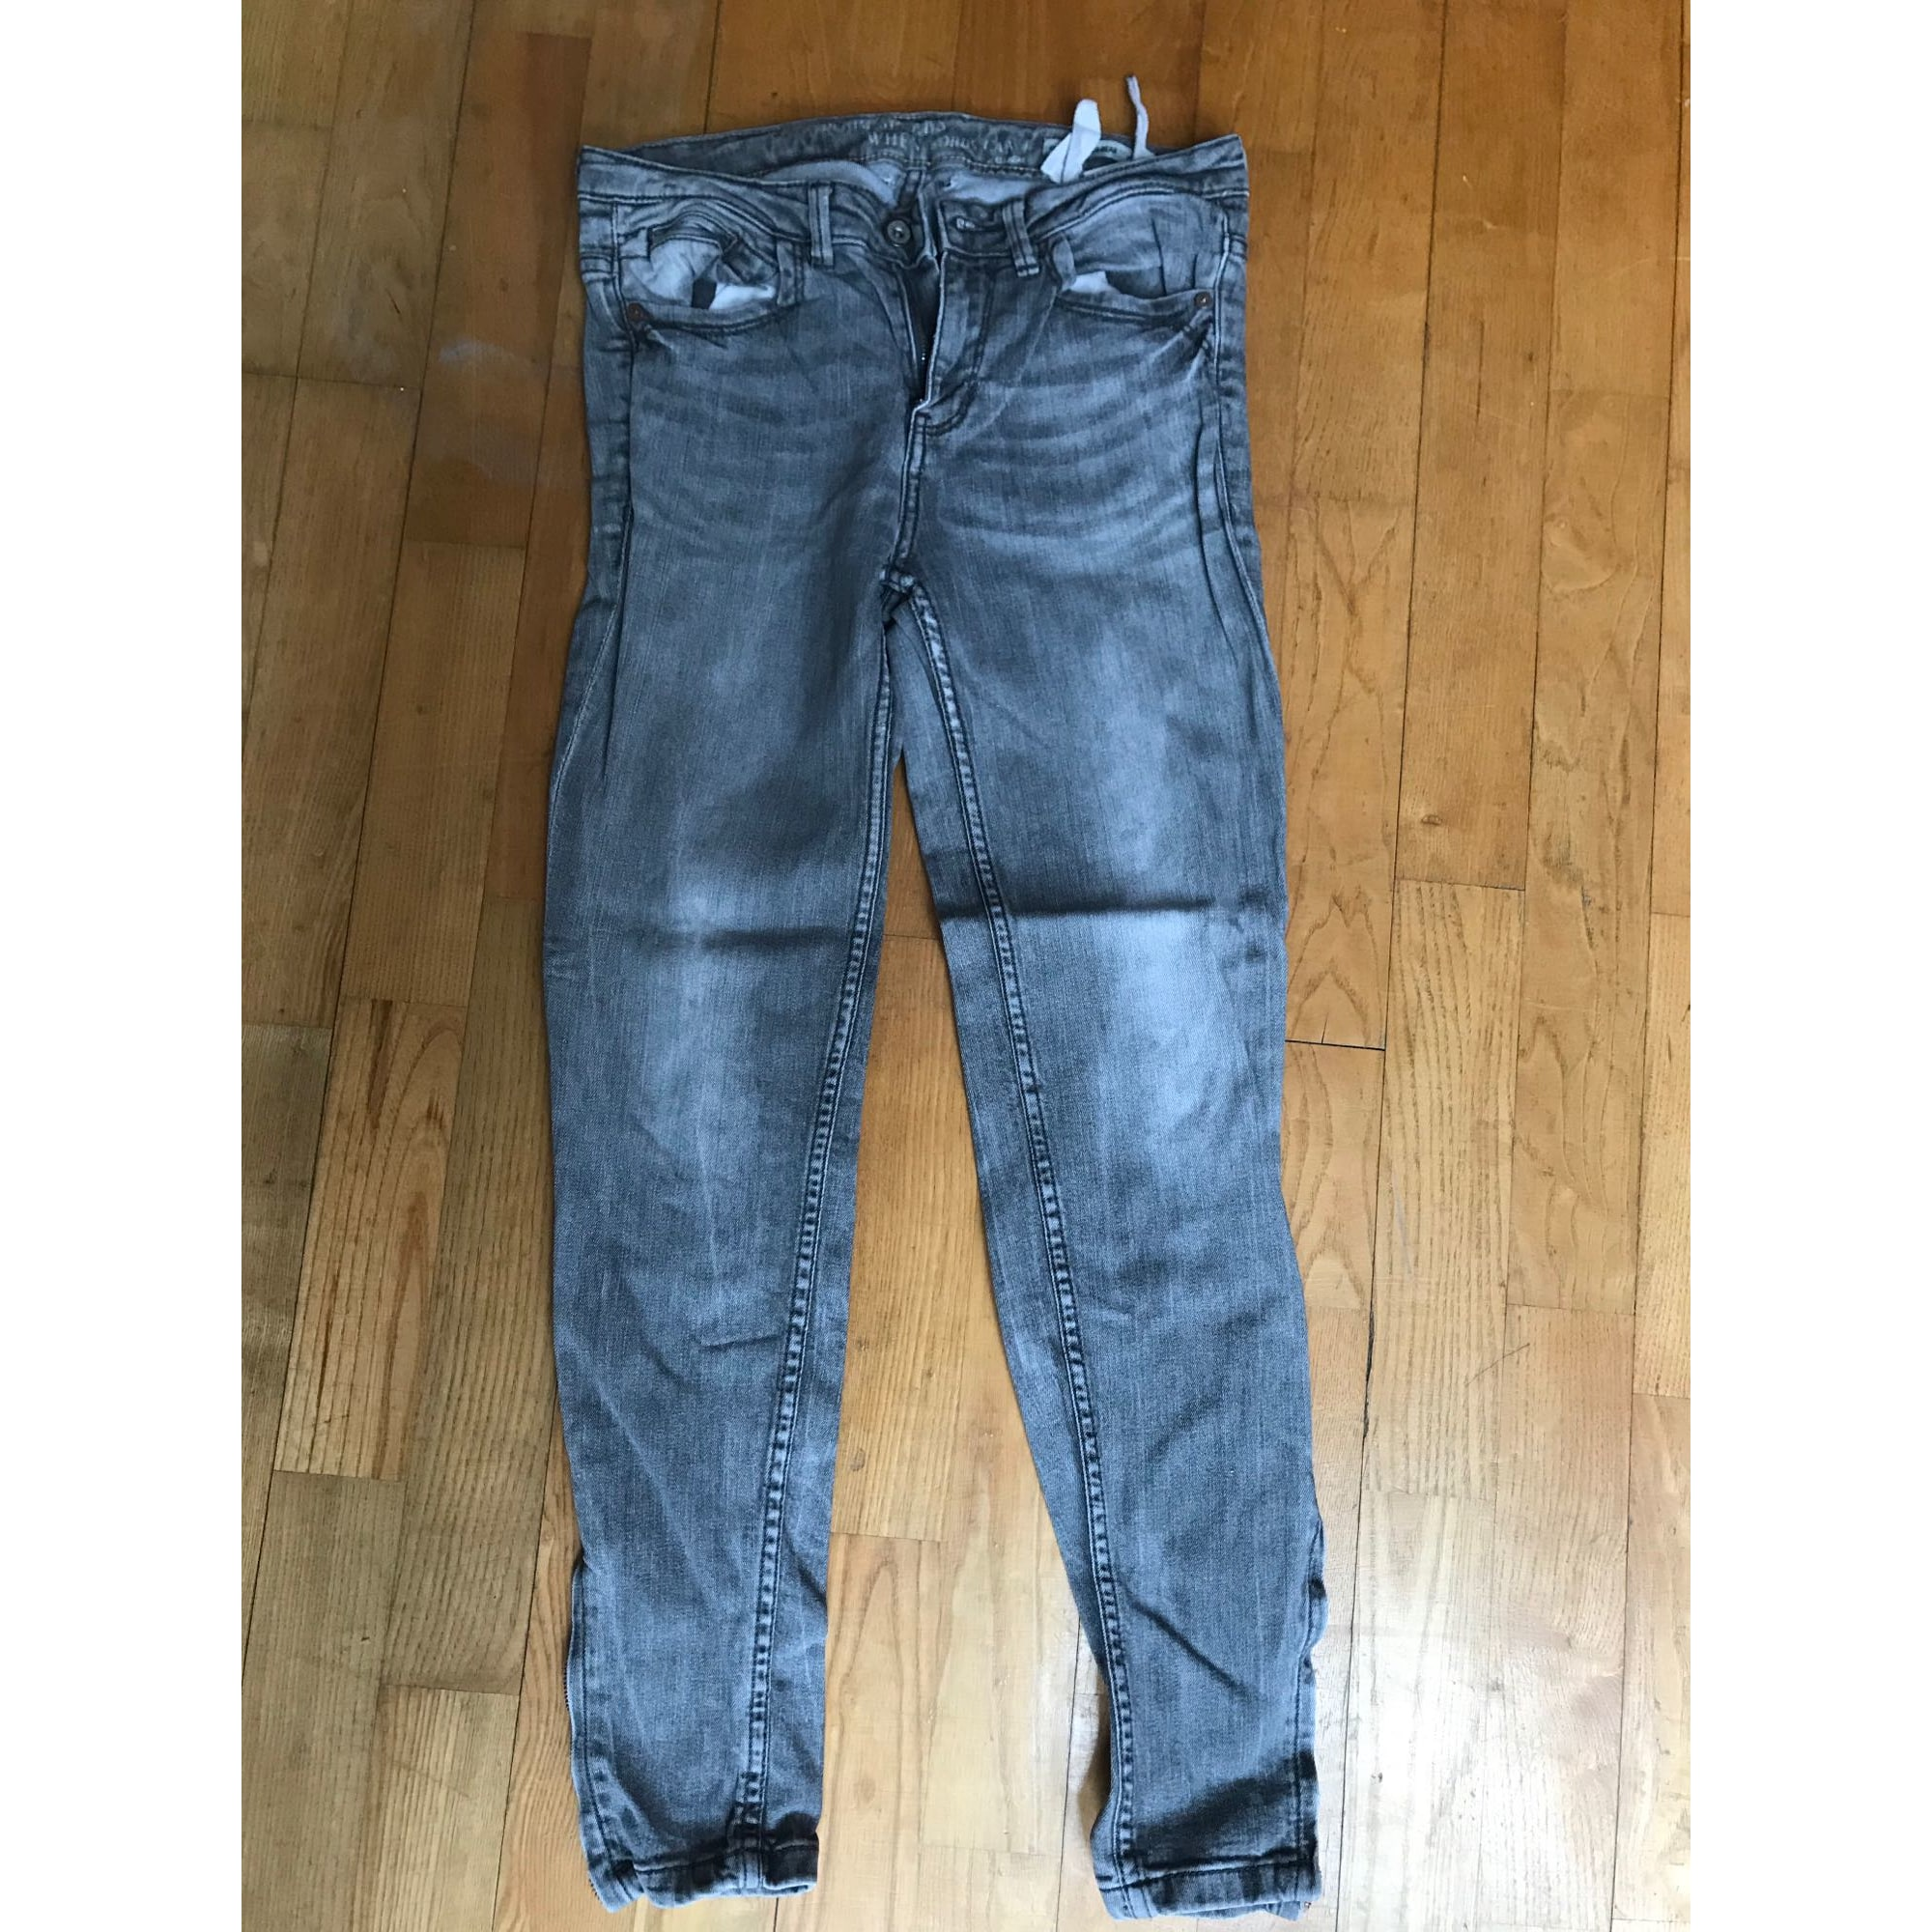 Jeans slim PULL & BEAR Gris, anthracite